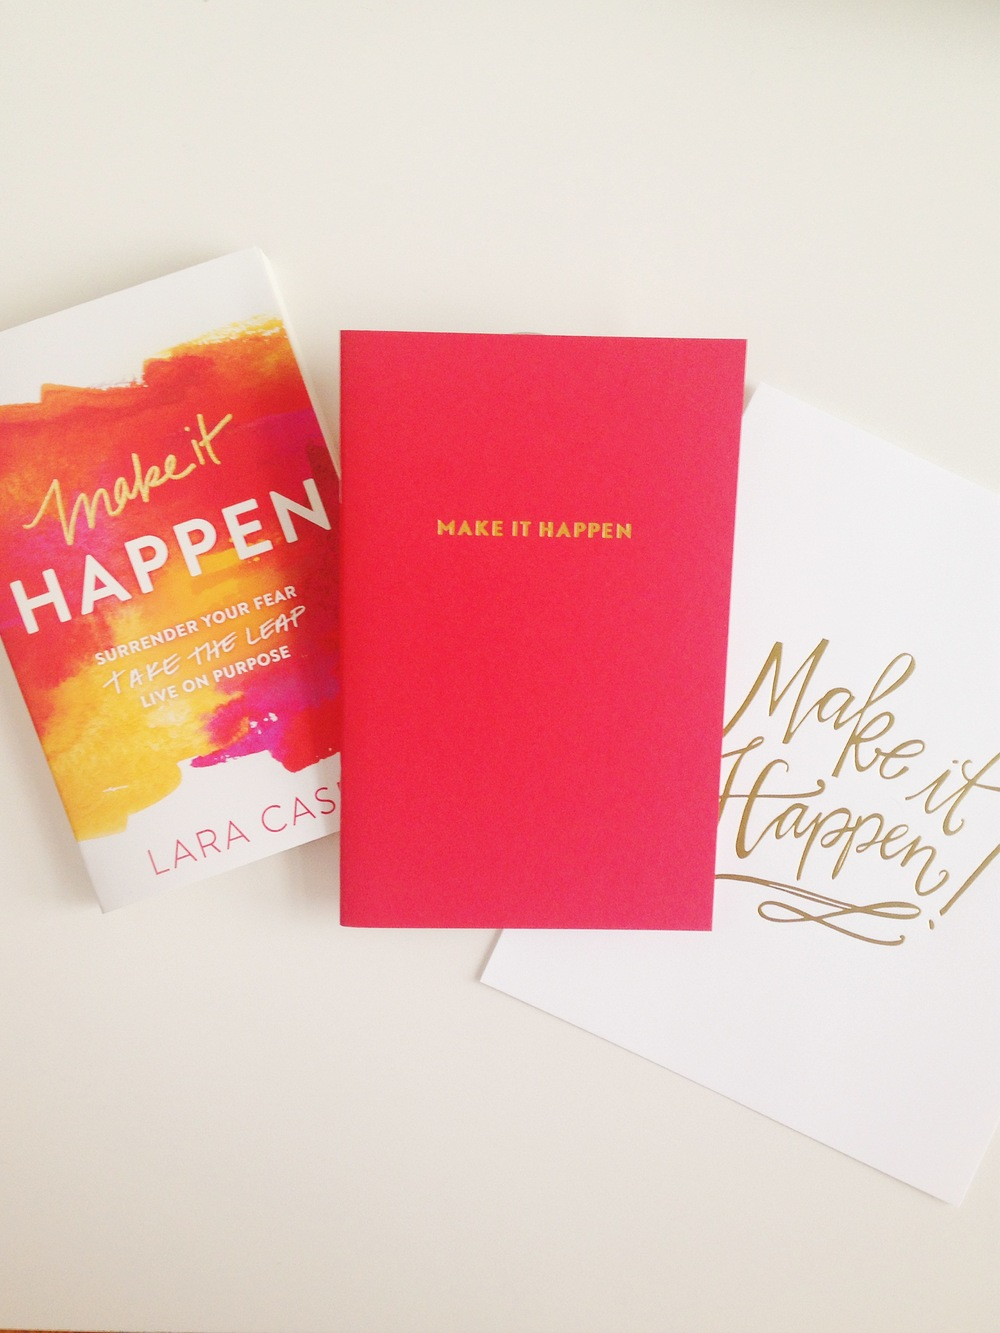 Make It Happen Book, Make It Happen notebook, Make It Happen print